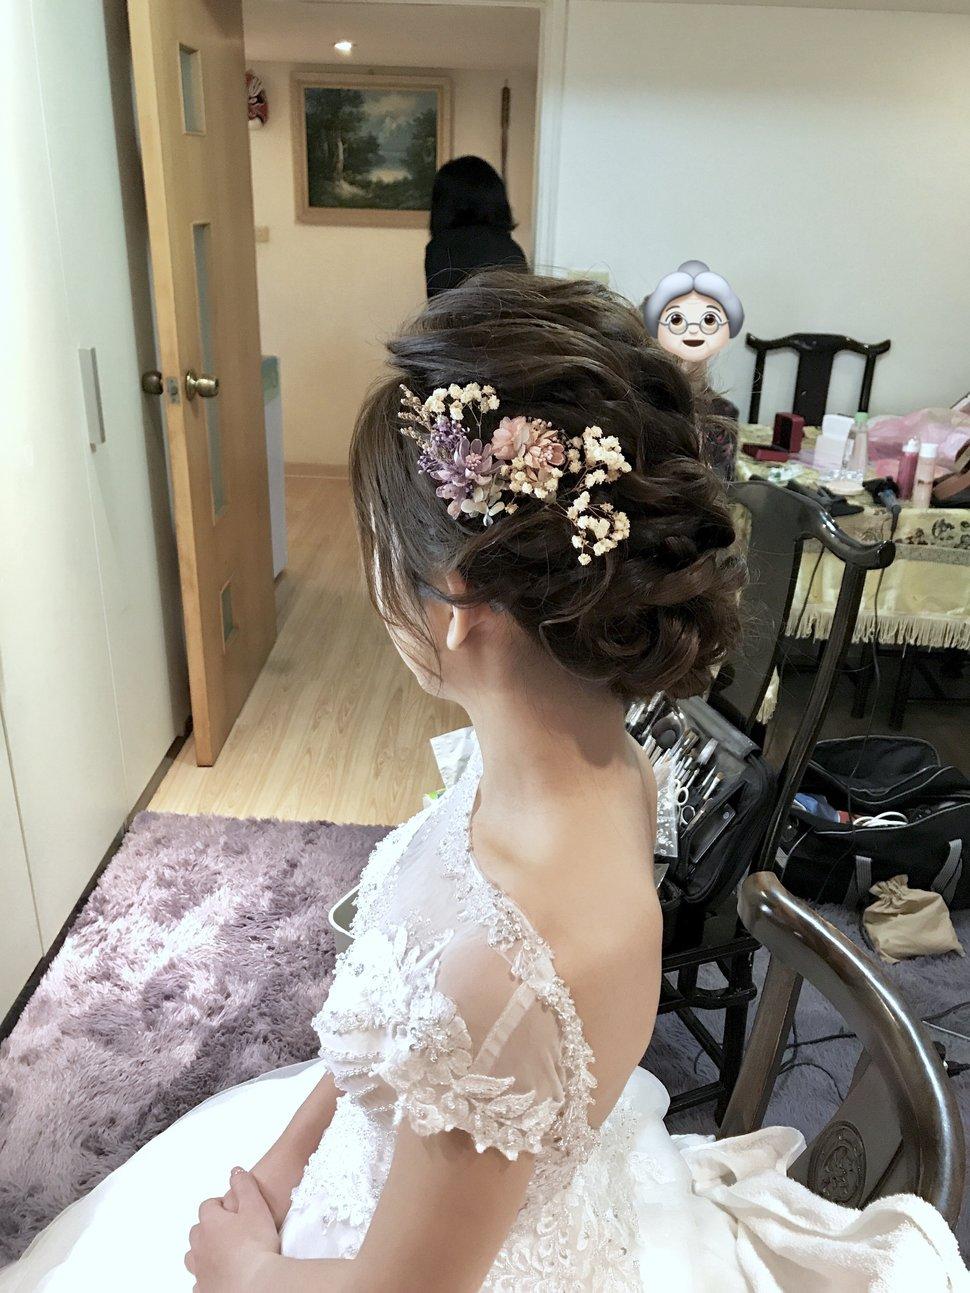 IMG_5113 - 新秘Heidi's style(新北市) - 結婚吧